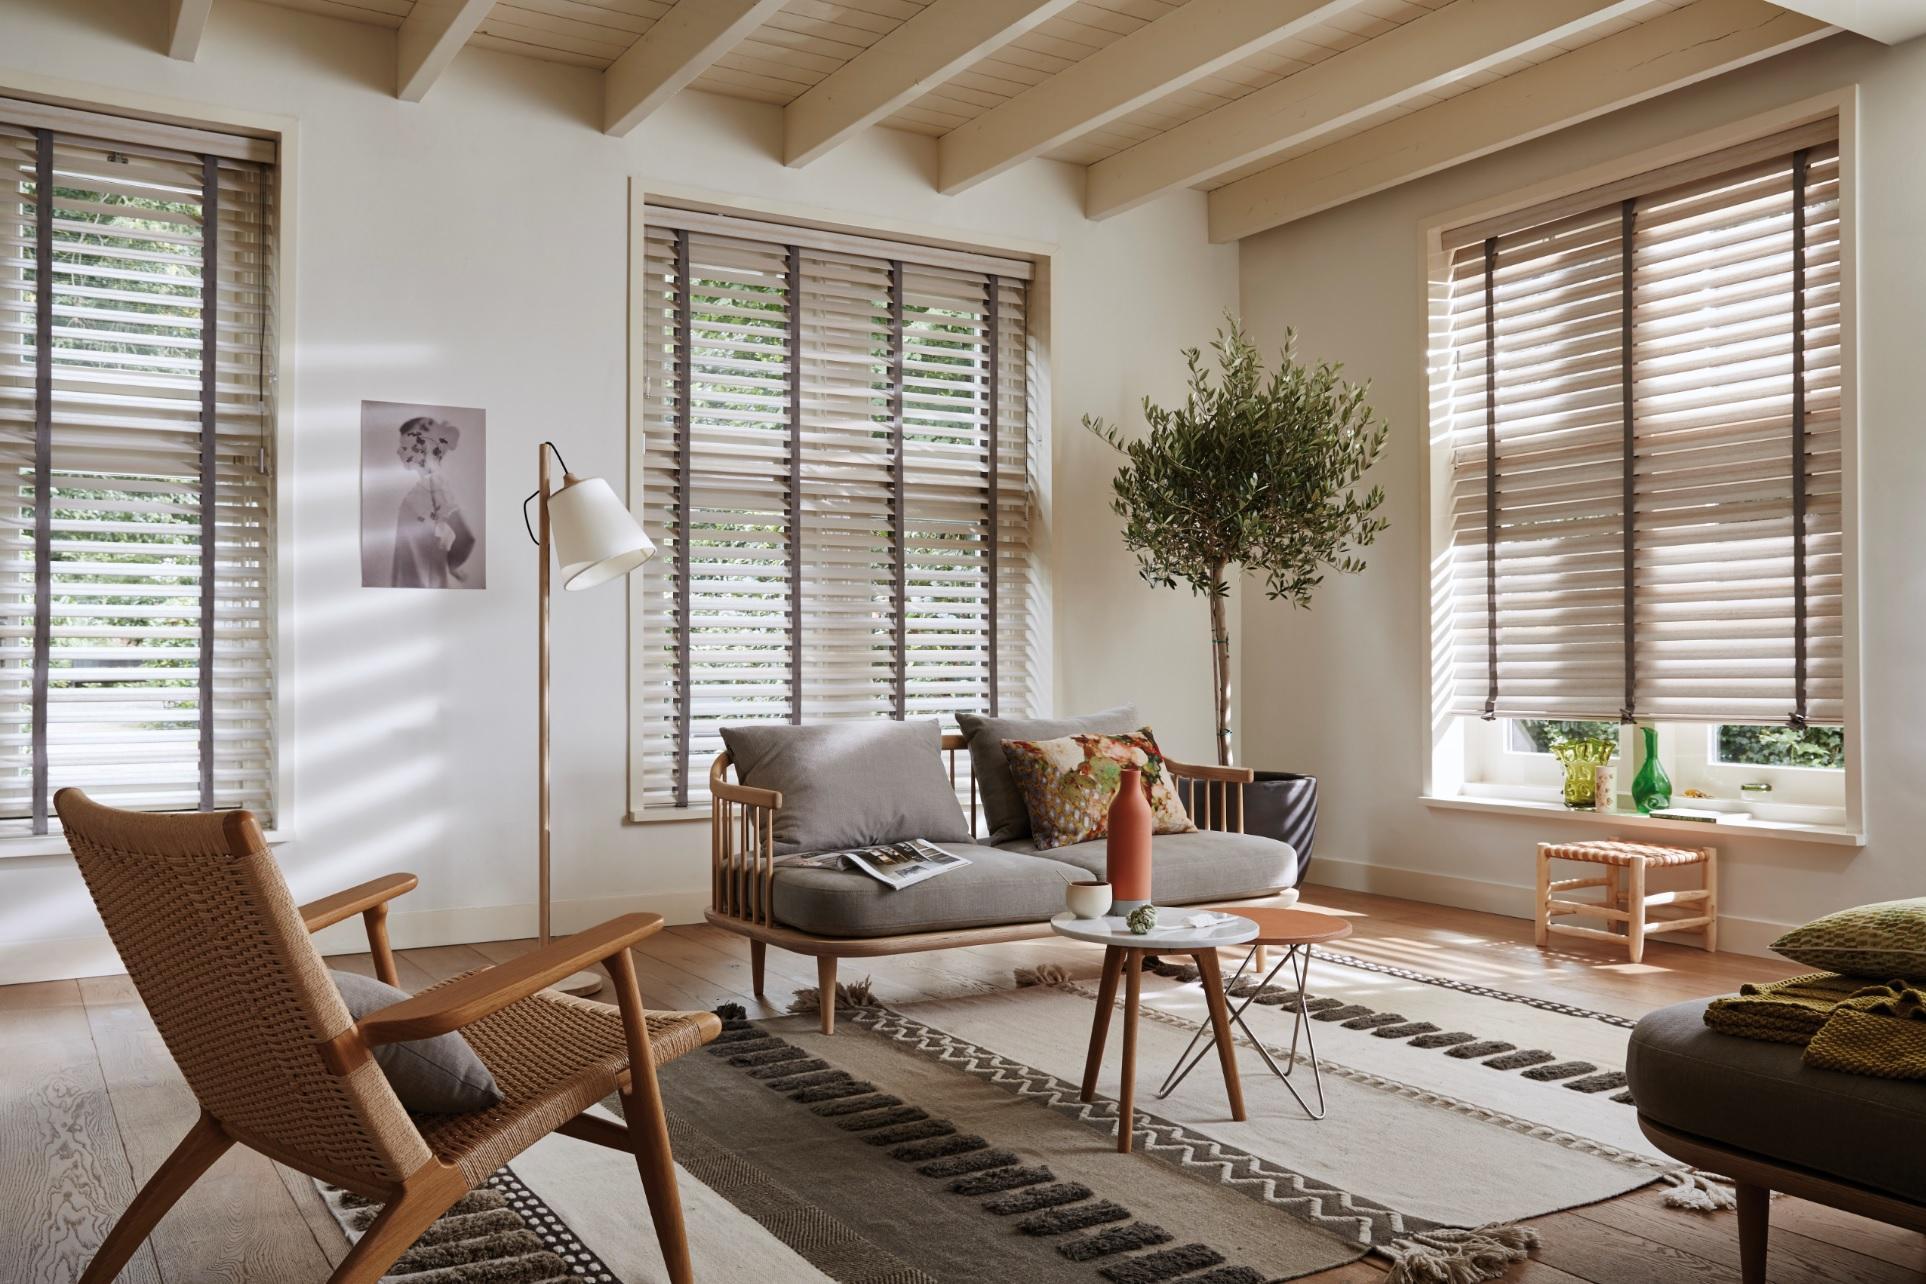 Jouw woning verduurzamen met bamboe jaloezieën